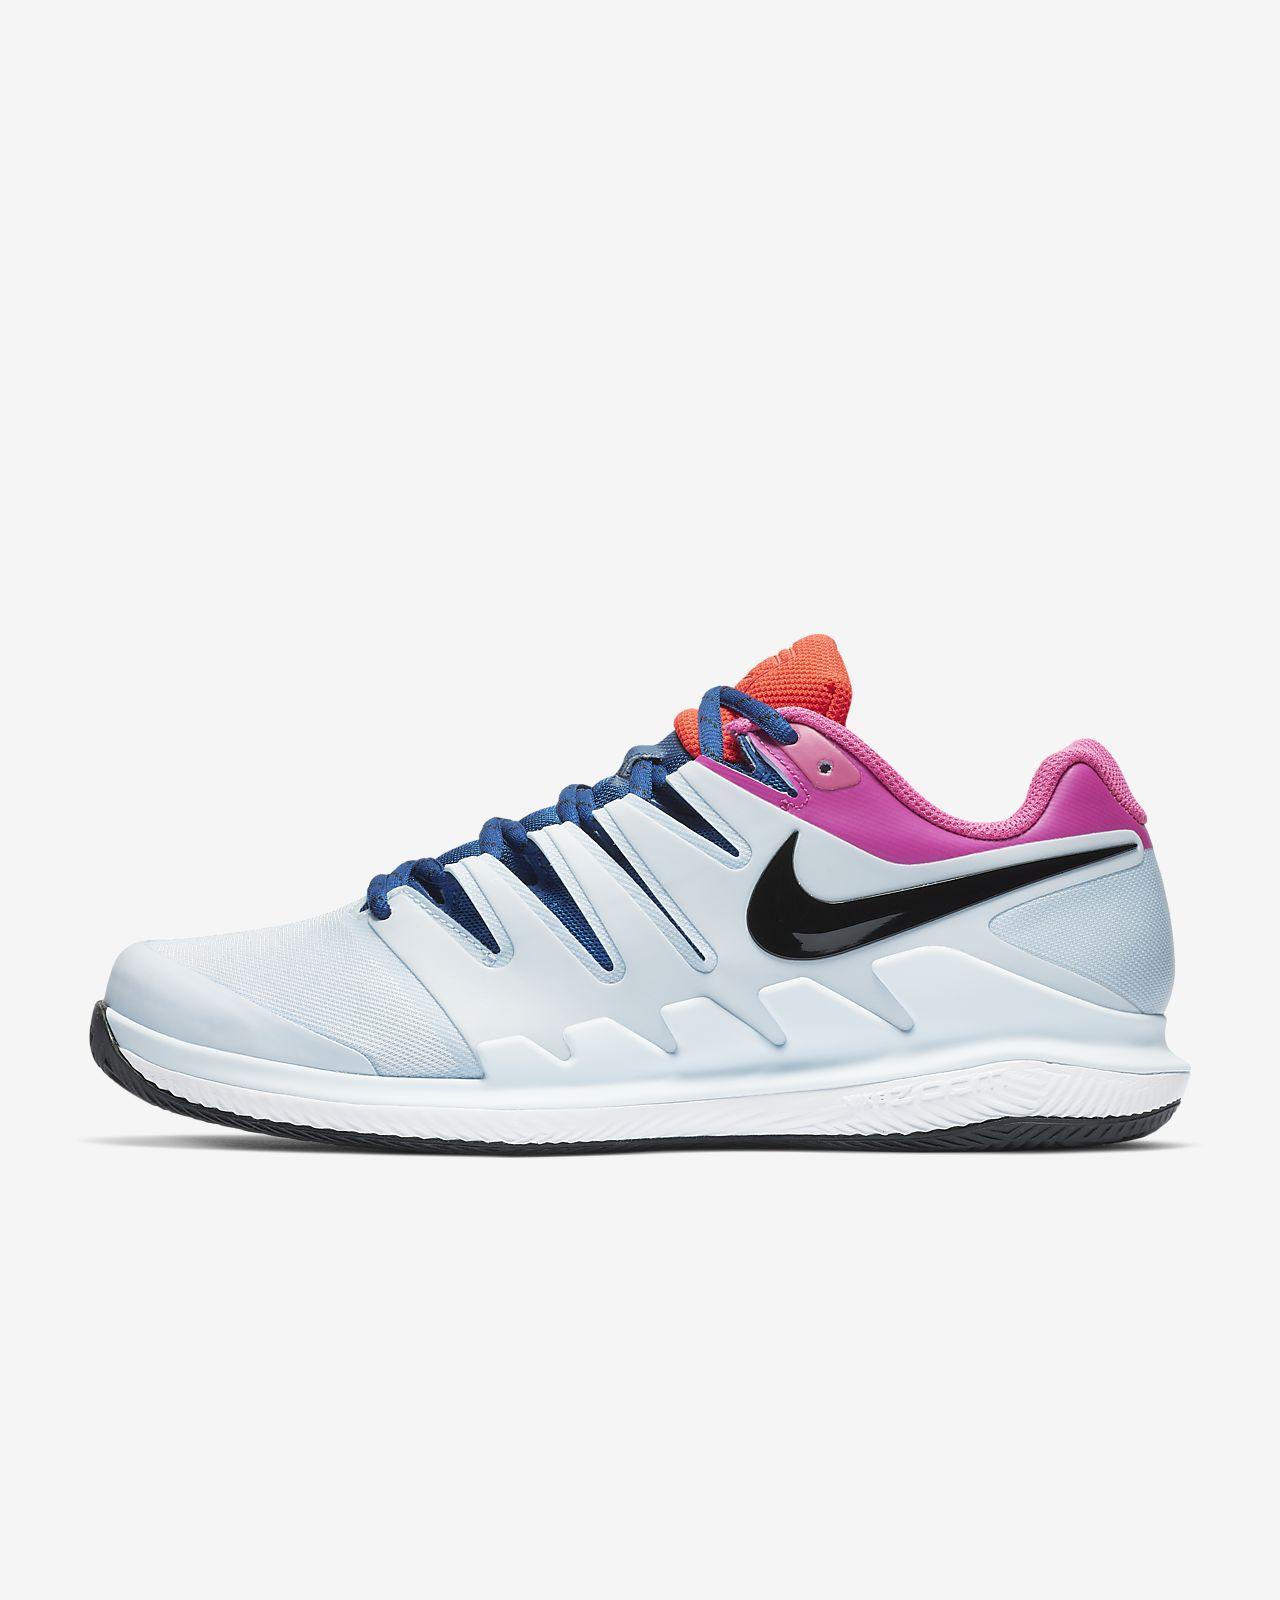 brand new 9aefb 1de68 Men s Tennis Shoe. Nike Air Zoom Vapor X Clay